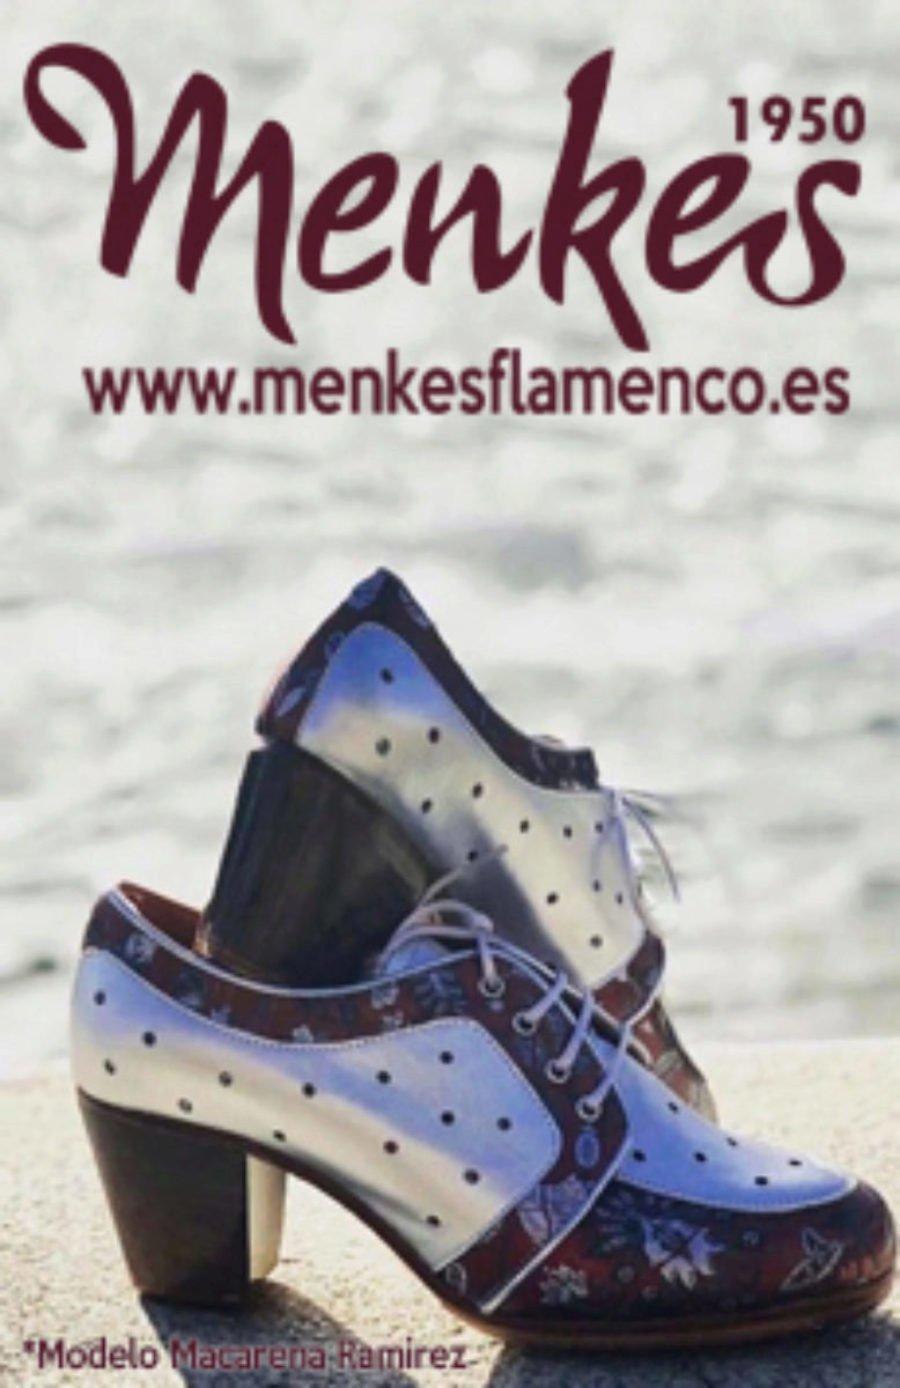 MENKES, ZAPATO FLAMENCO, OFERTA ESPECIAL PARA ZOCO FLAMENCO